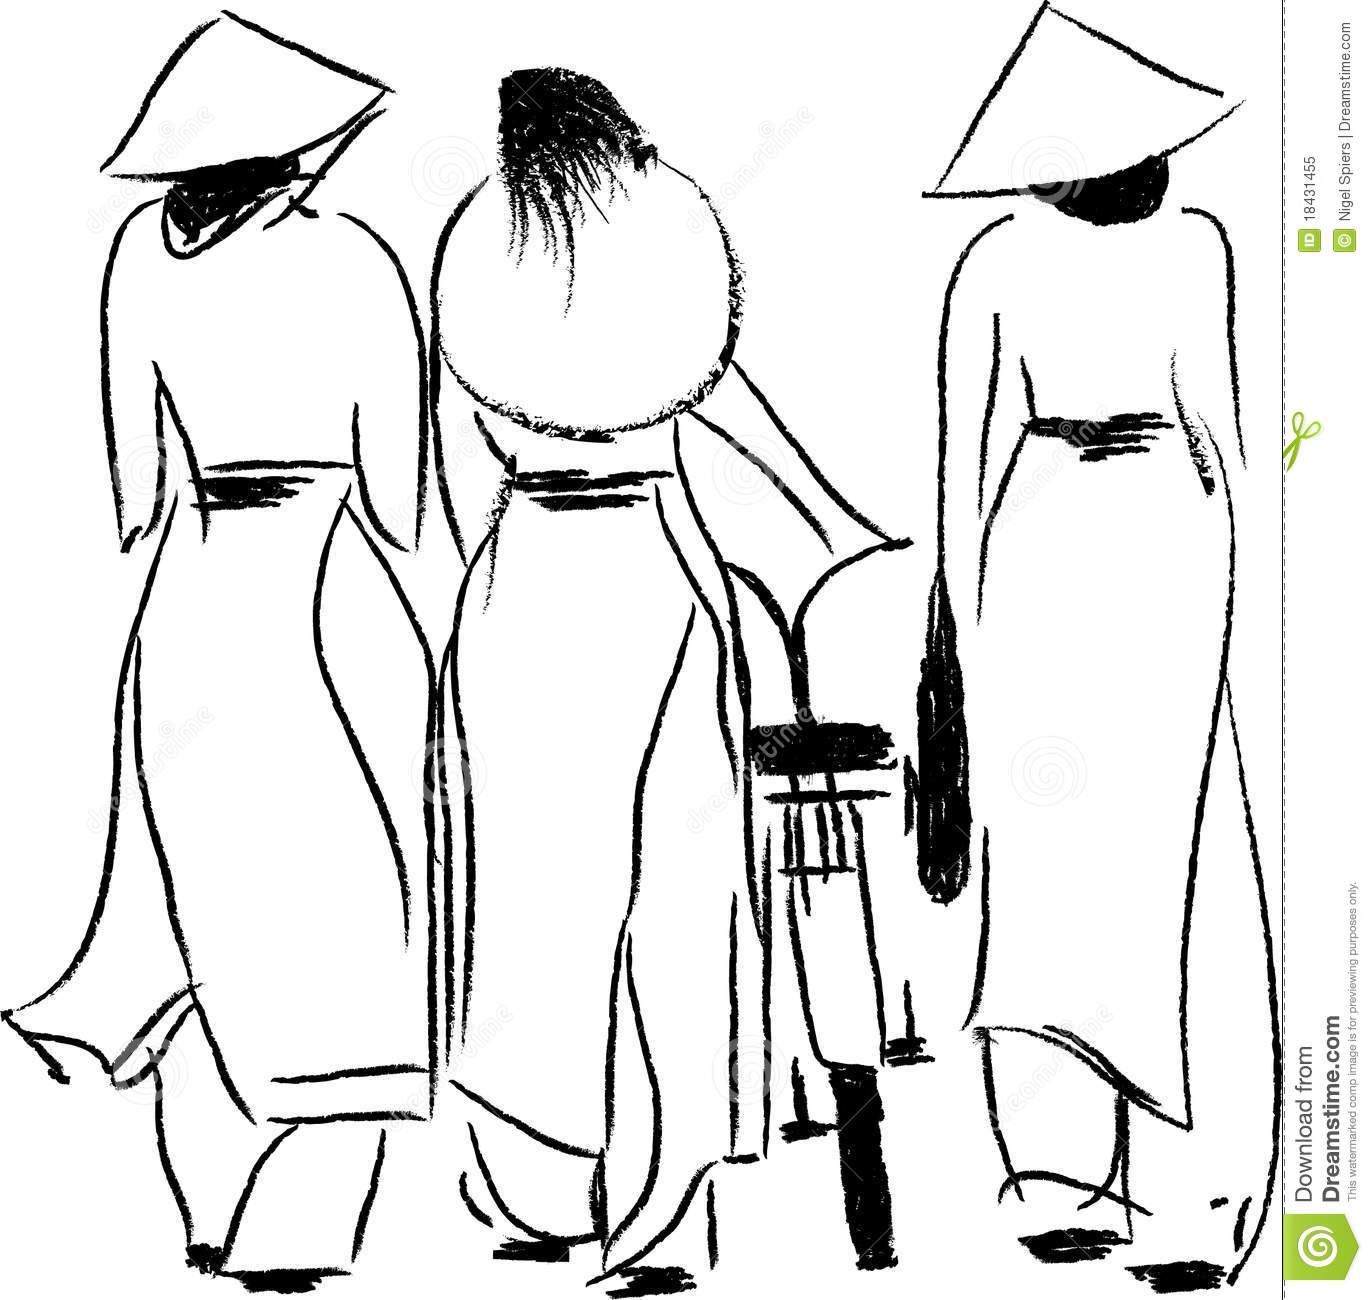 Vietnam clipart #2, Download drawings